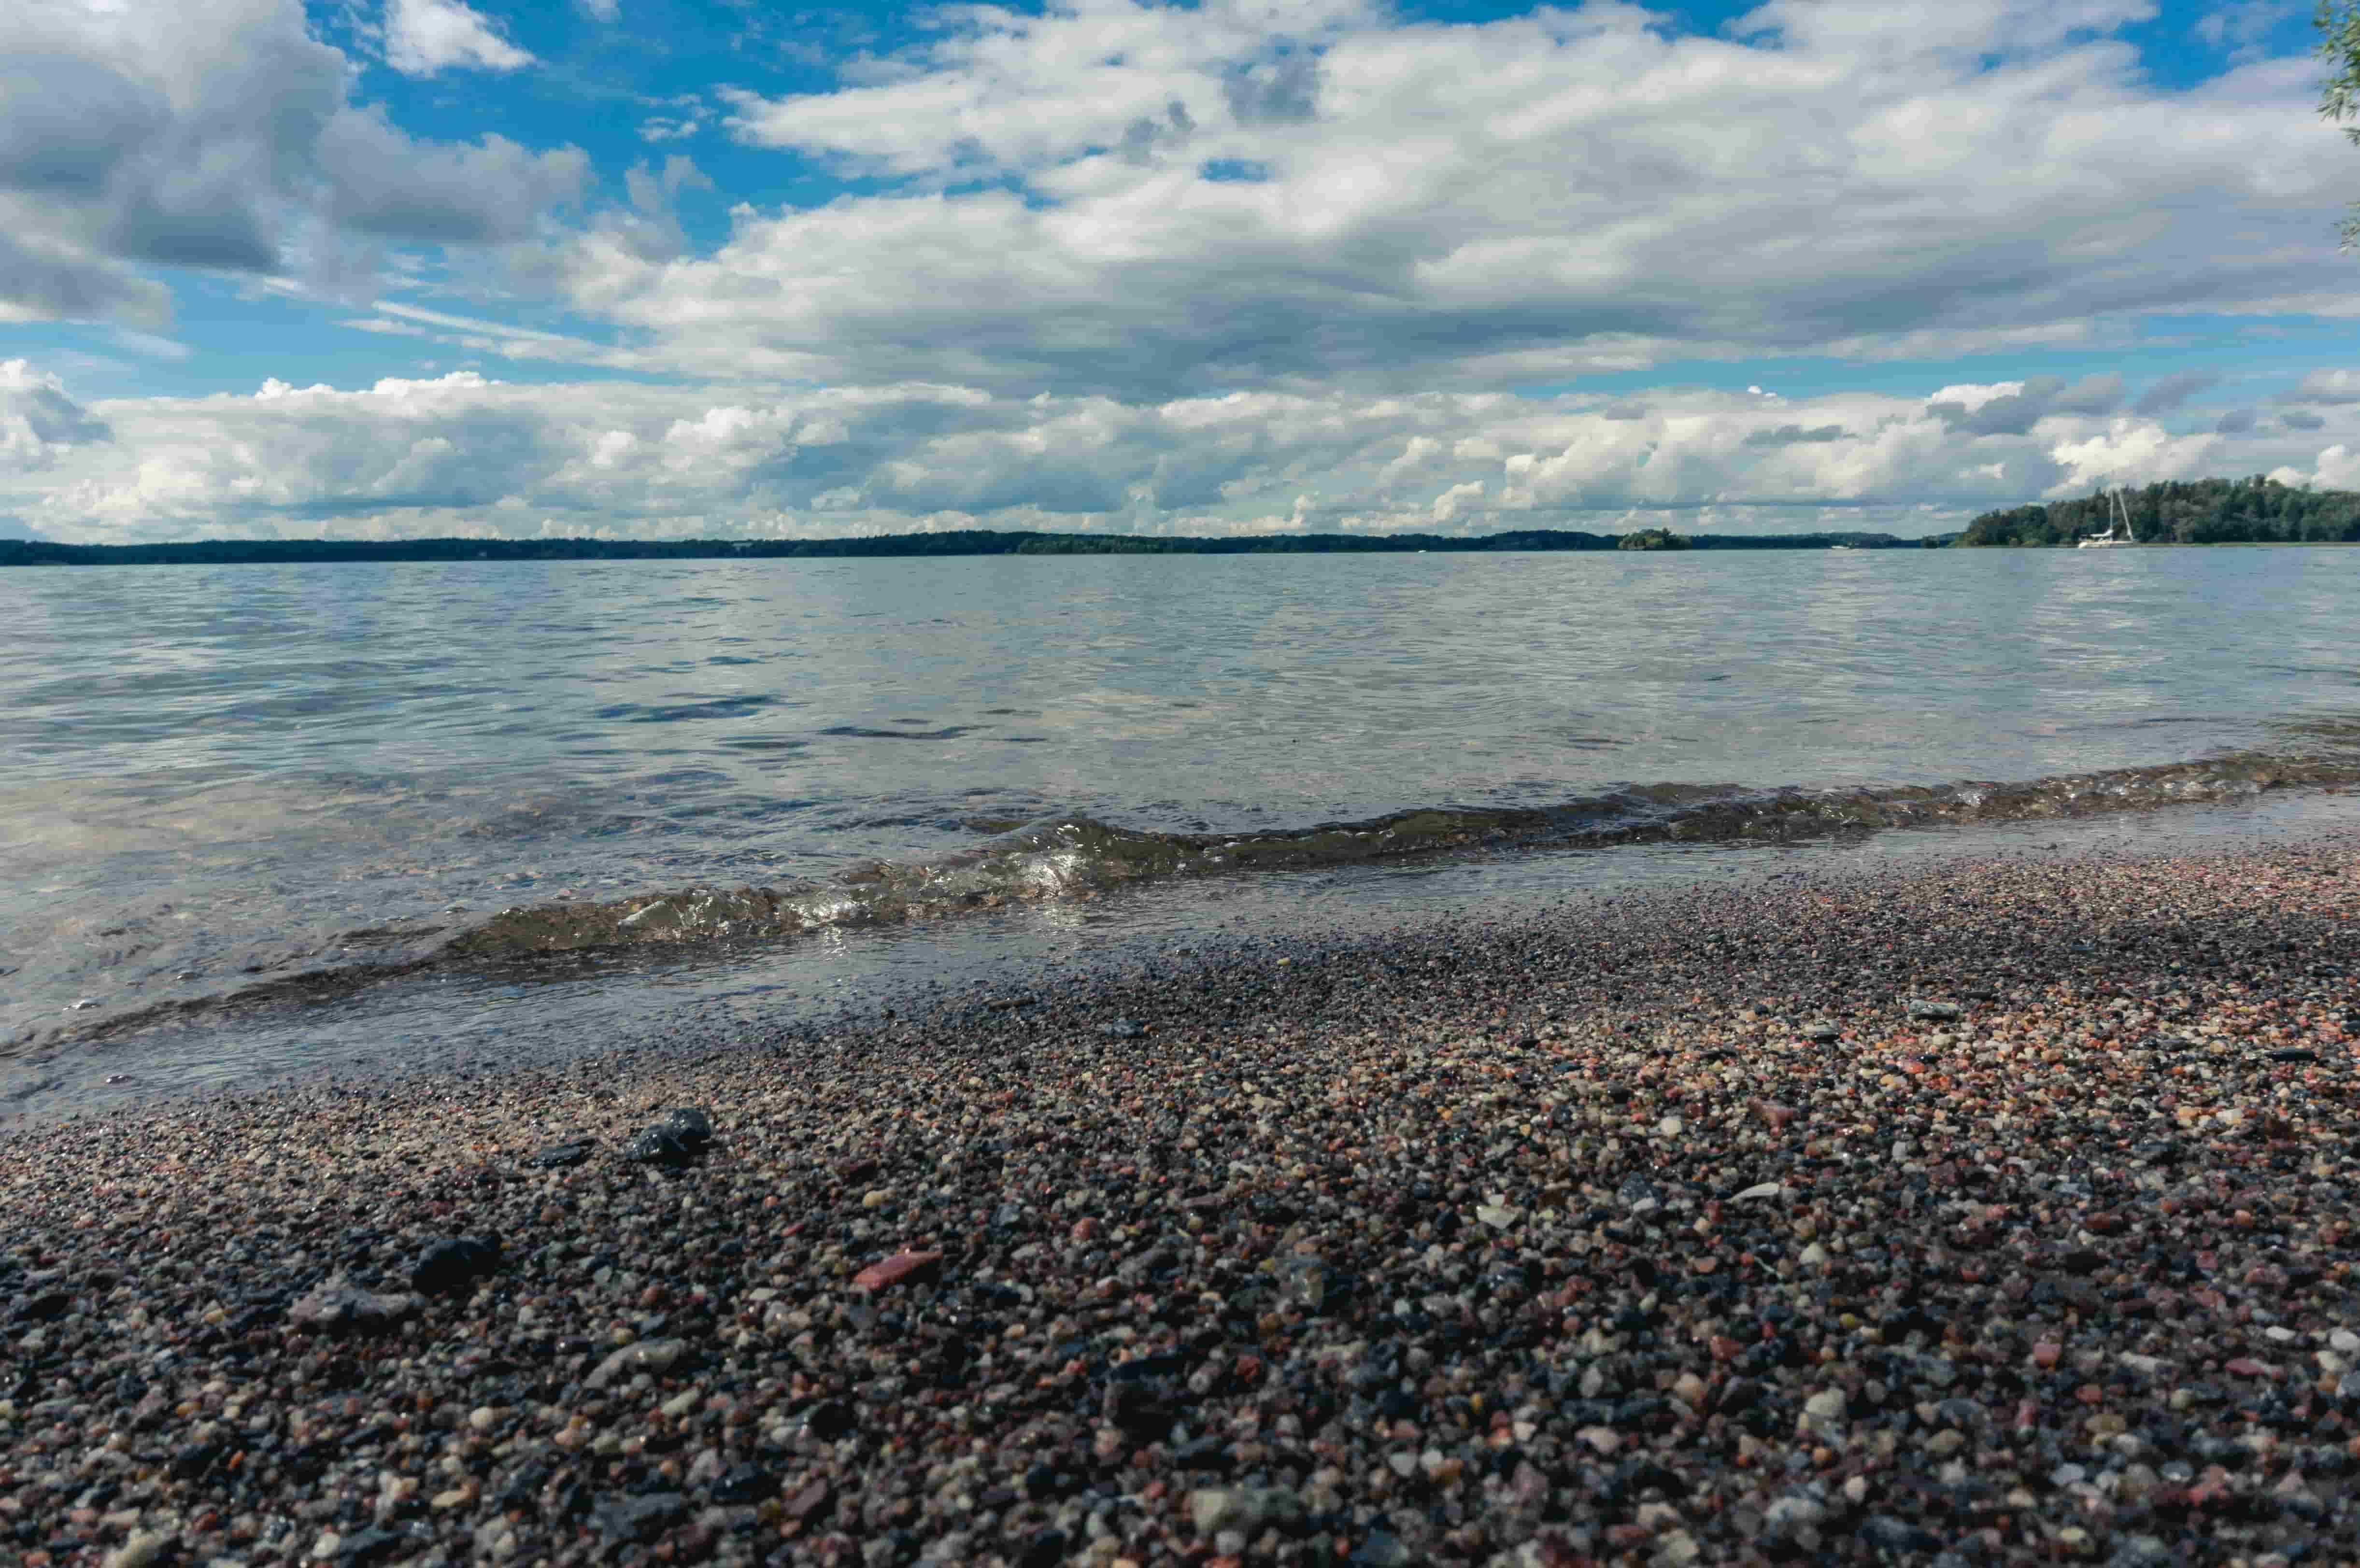 Stockholms beach